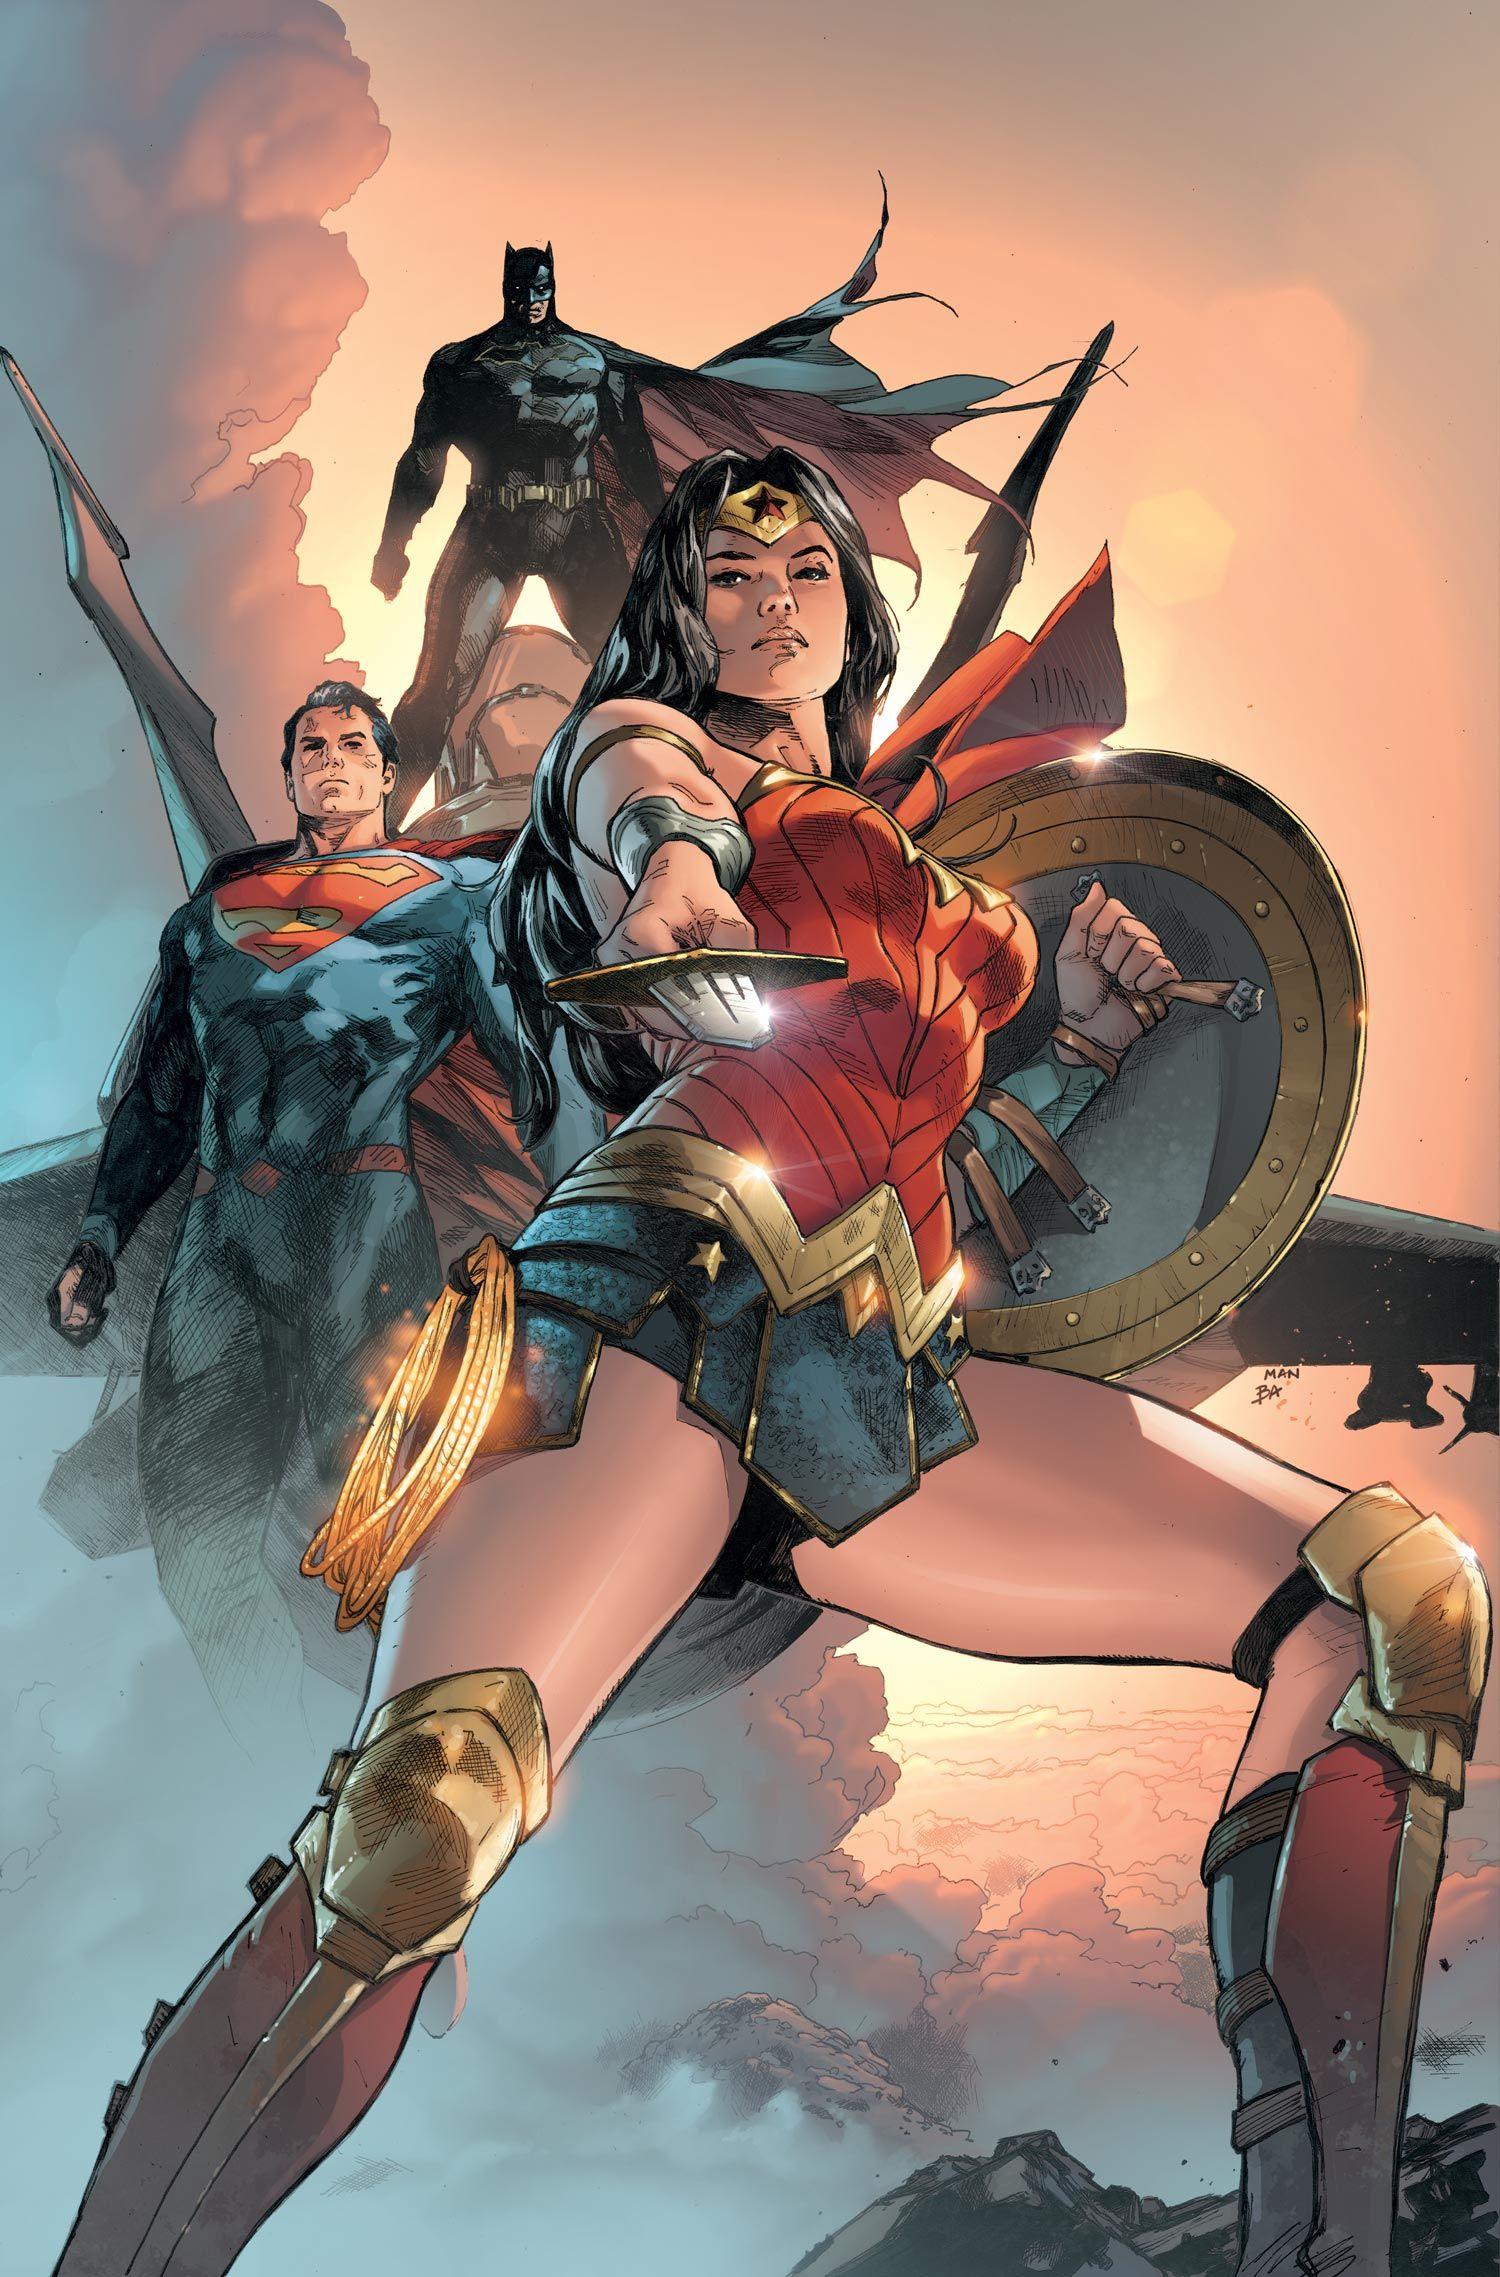 DC Comics Wonder Woman, Superman, Batman. For similar content follow me @jpsunshine10041